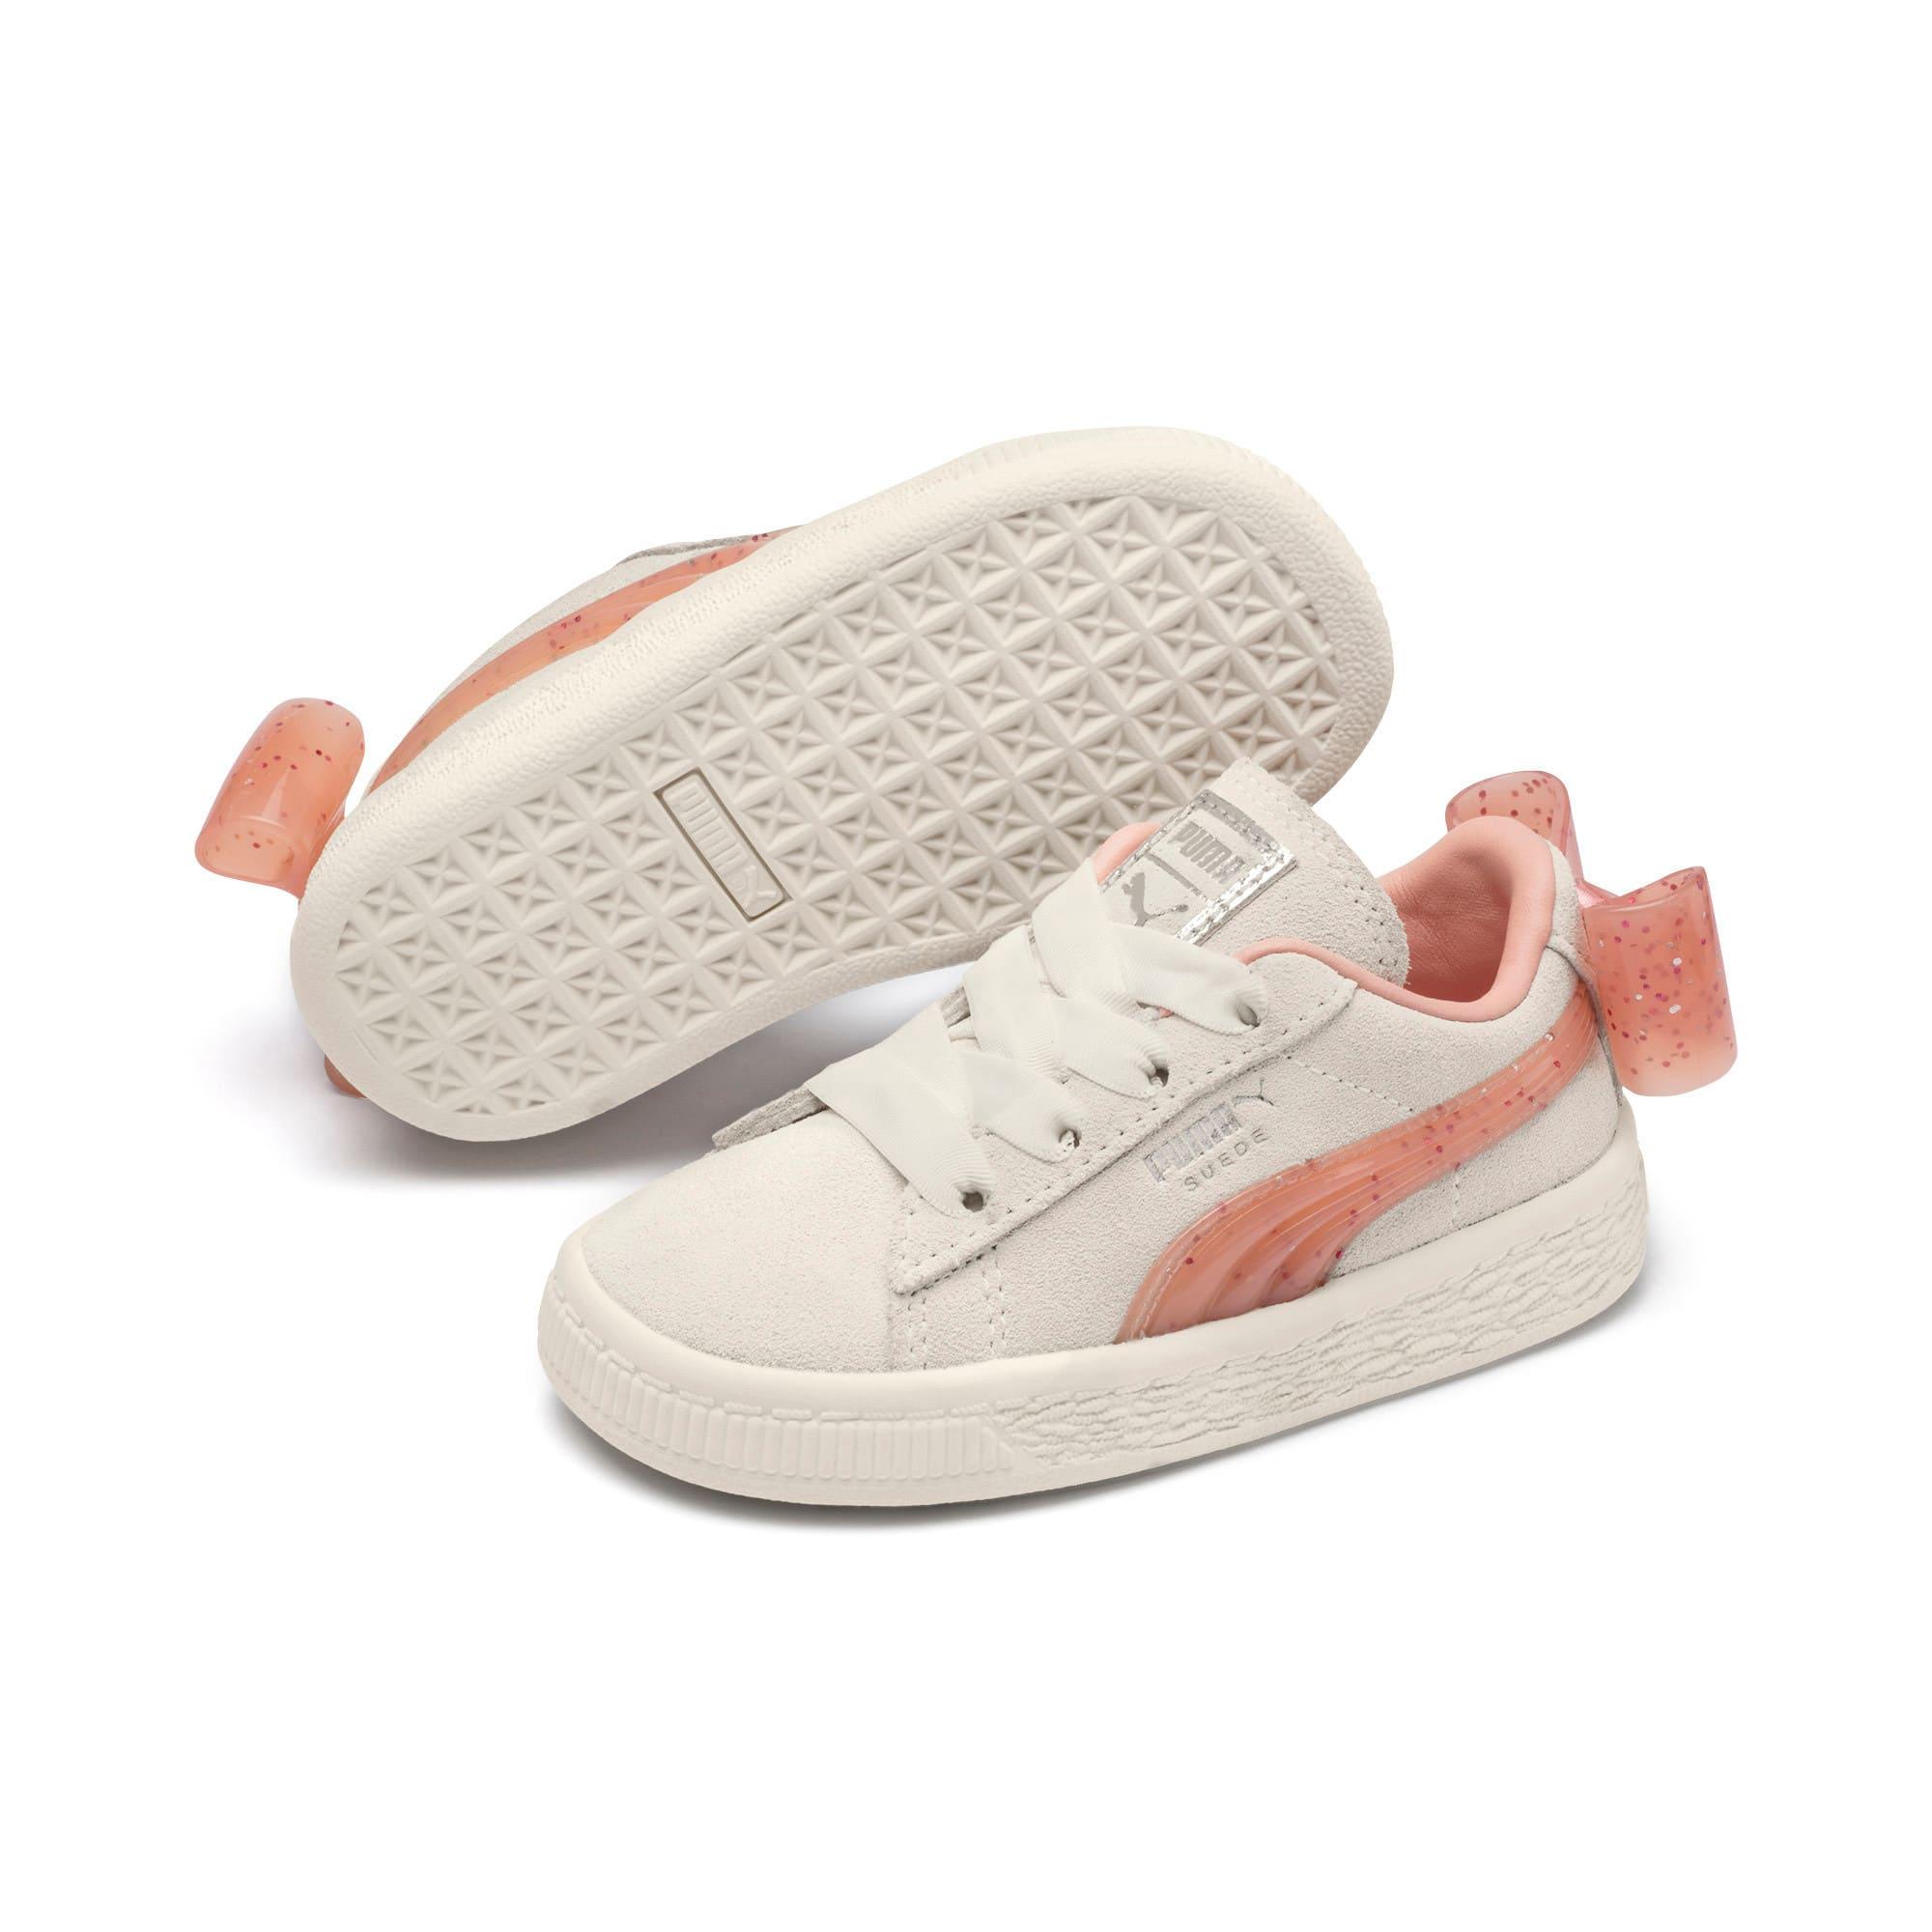 Miniatura 2 de Zapatos Suede Jelly Bow AC para niños, Whis White-Peach Bud-Silver, mediano